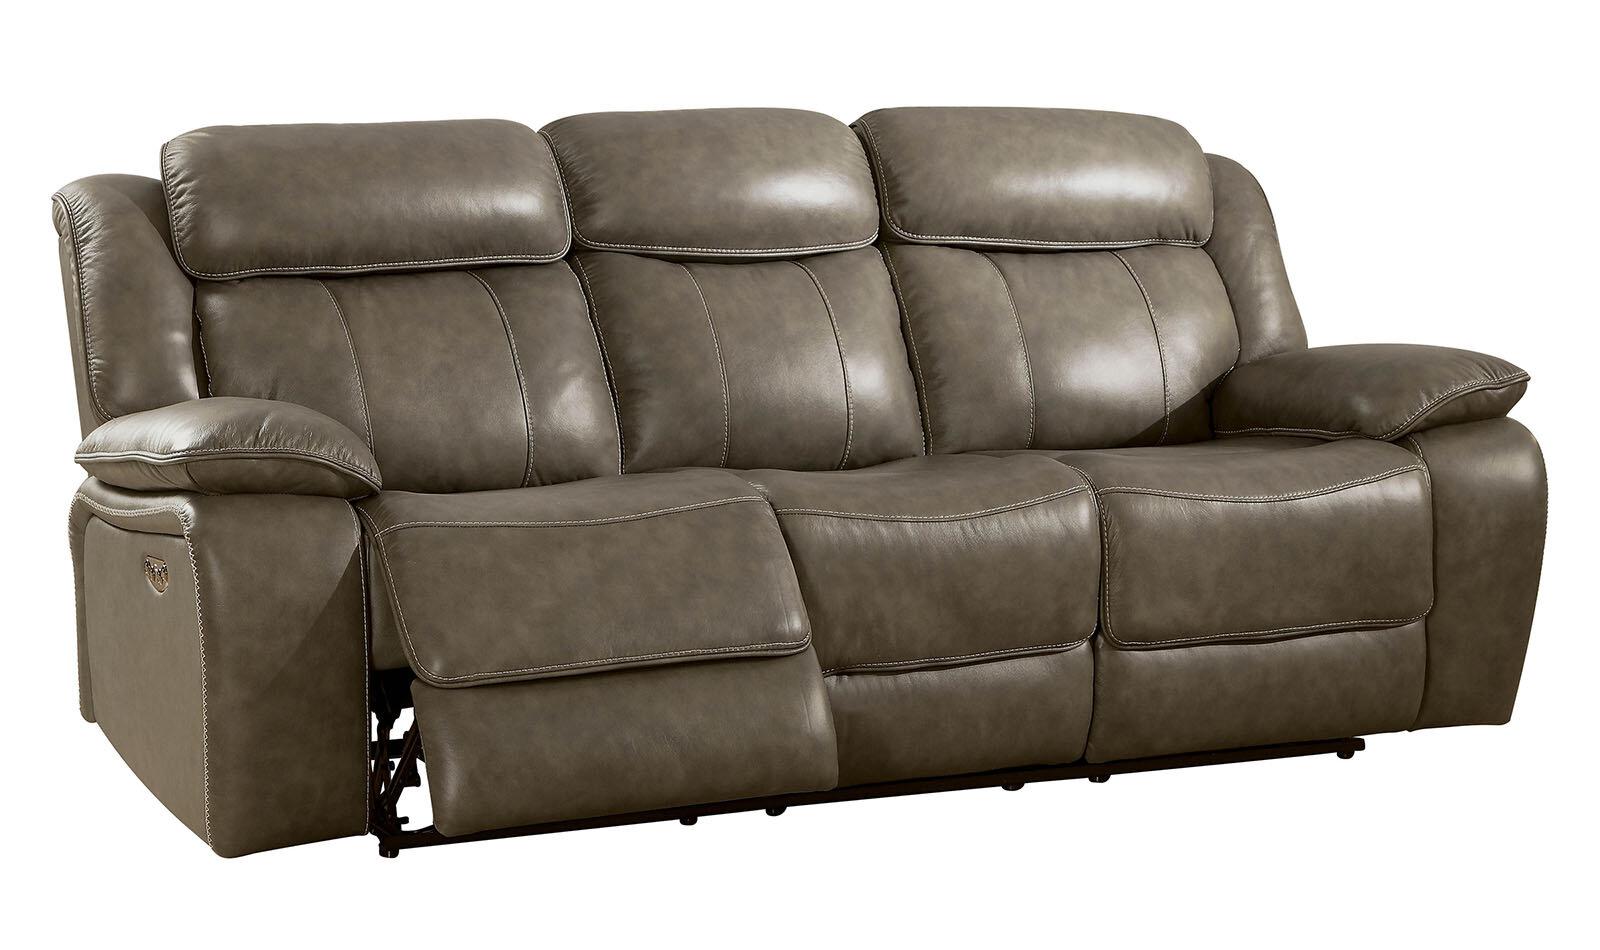 Heitzman Contemporary Sofa Leather Manual Wall Hugger Recliner